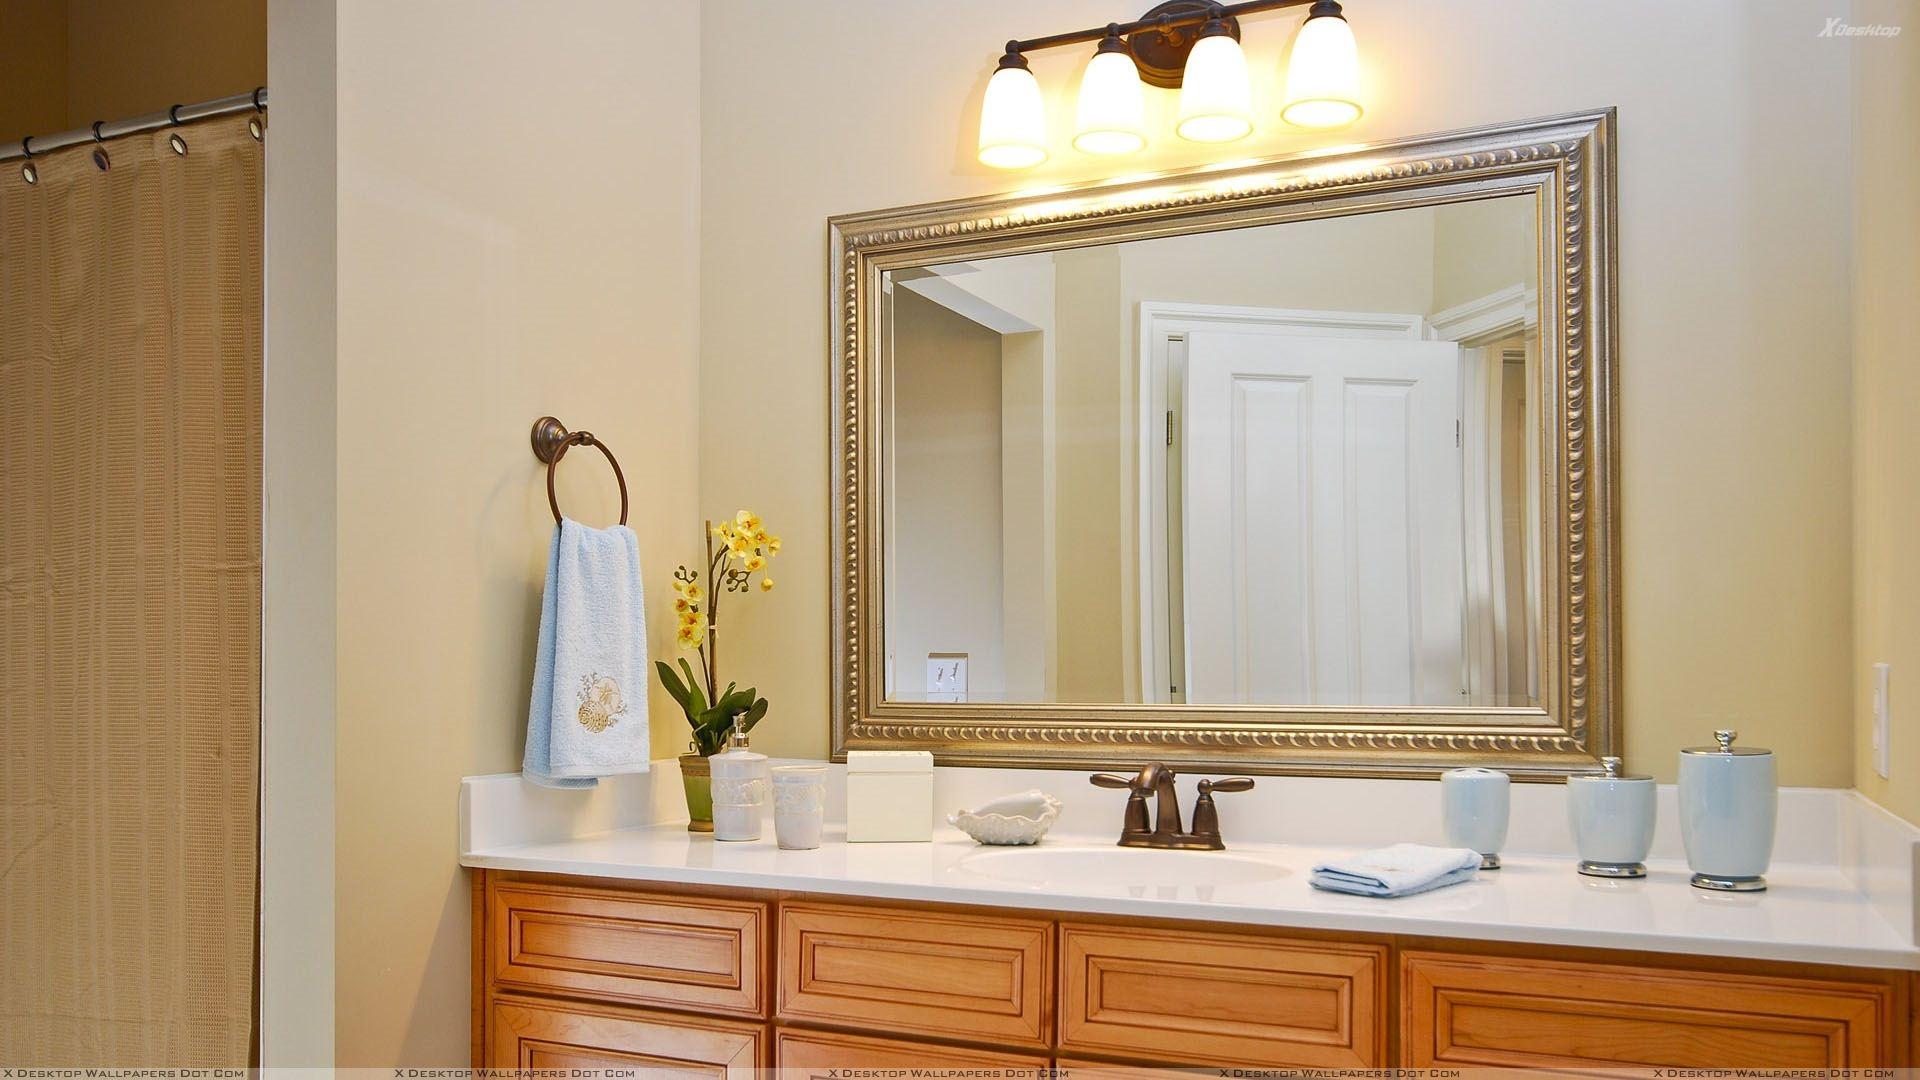 Bathroom Mirrors Large Rectangularlarge rectangular bathroom mirrors home